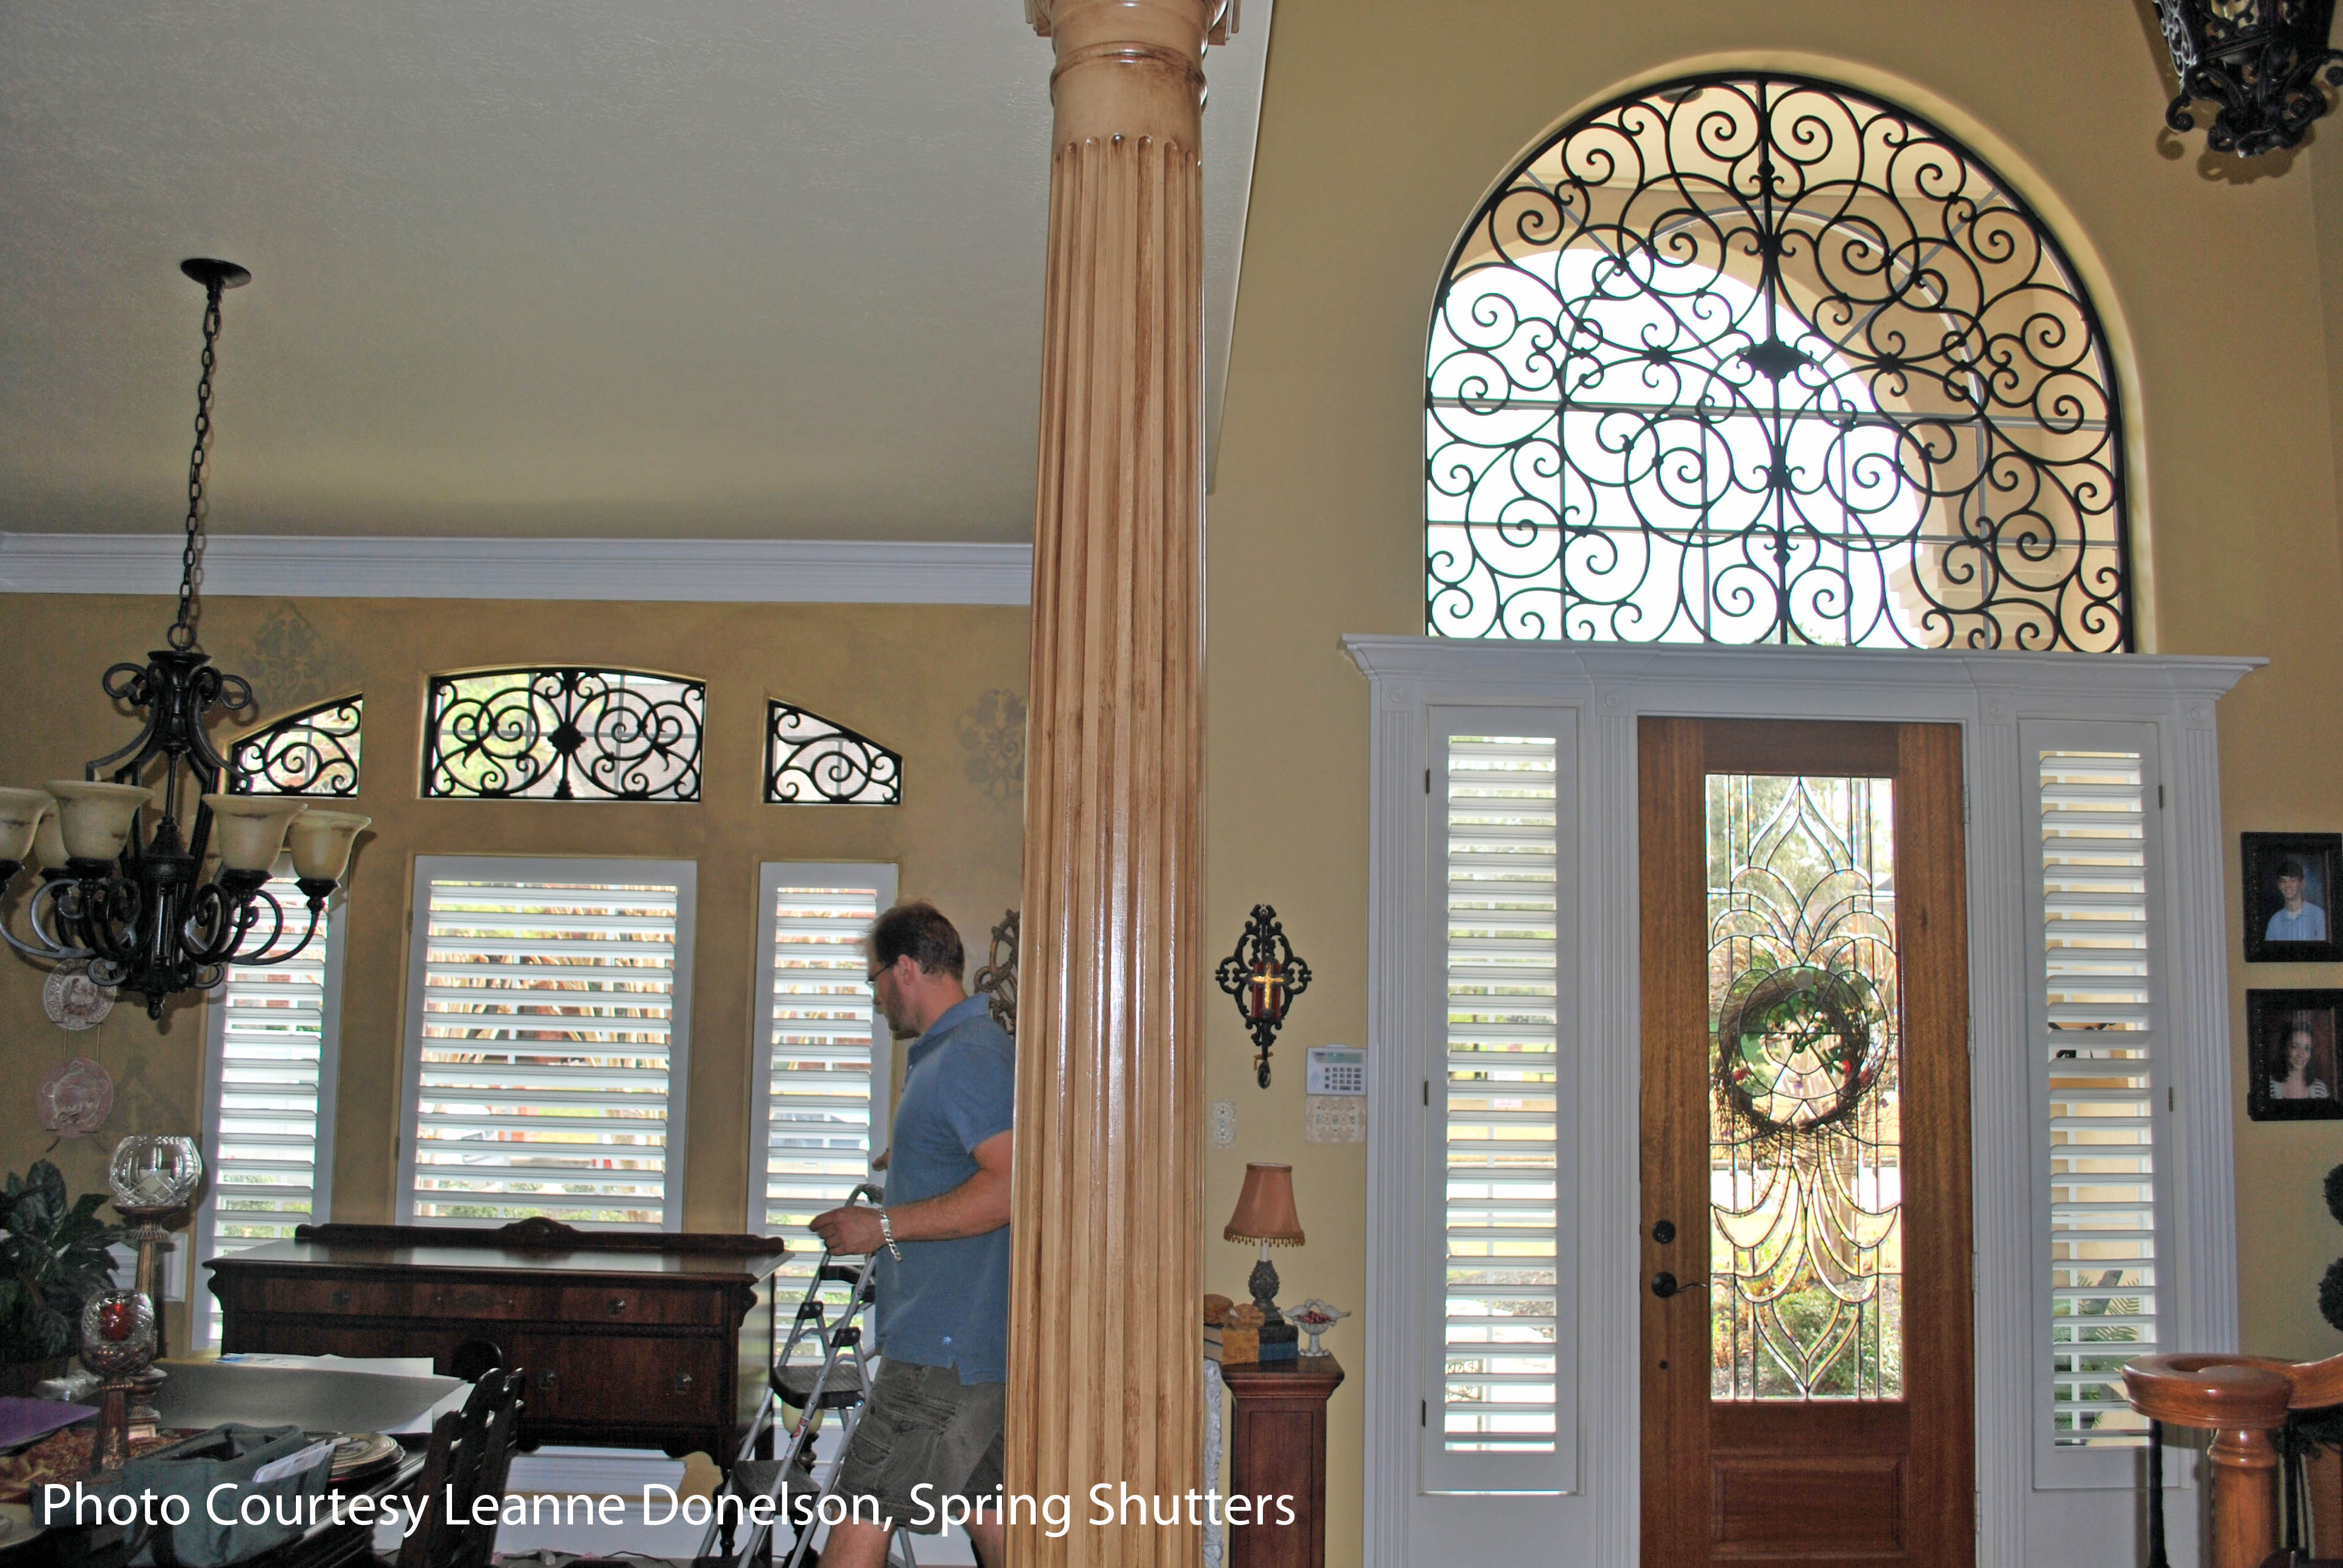 Faux Iron Window Treatment The Decorative Iron Window